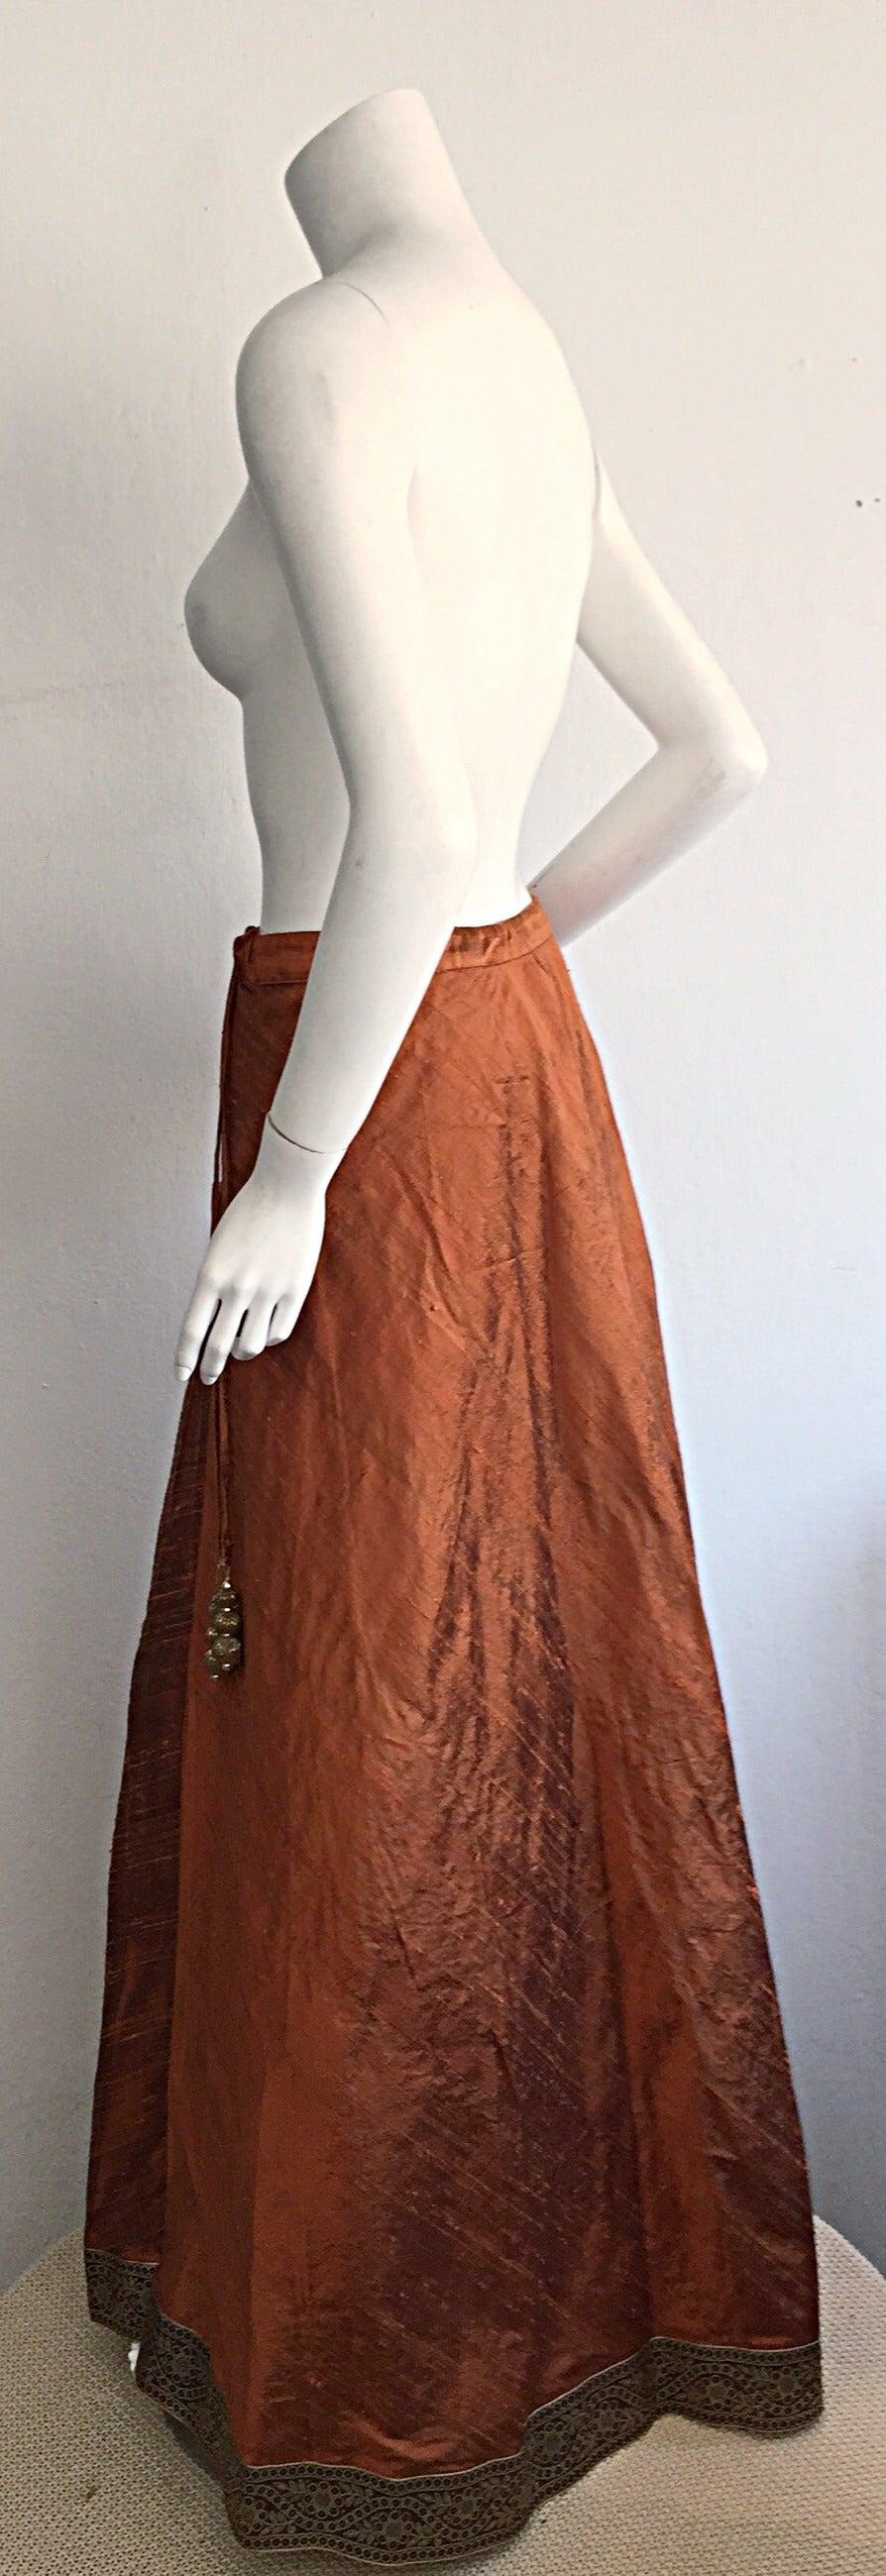 1970s Vintage Burnt Orange Raw Silk Indian Bohemian Tassel Maxi Skirt 7